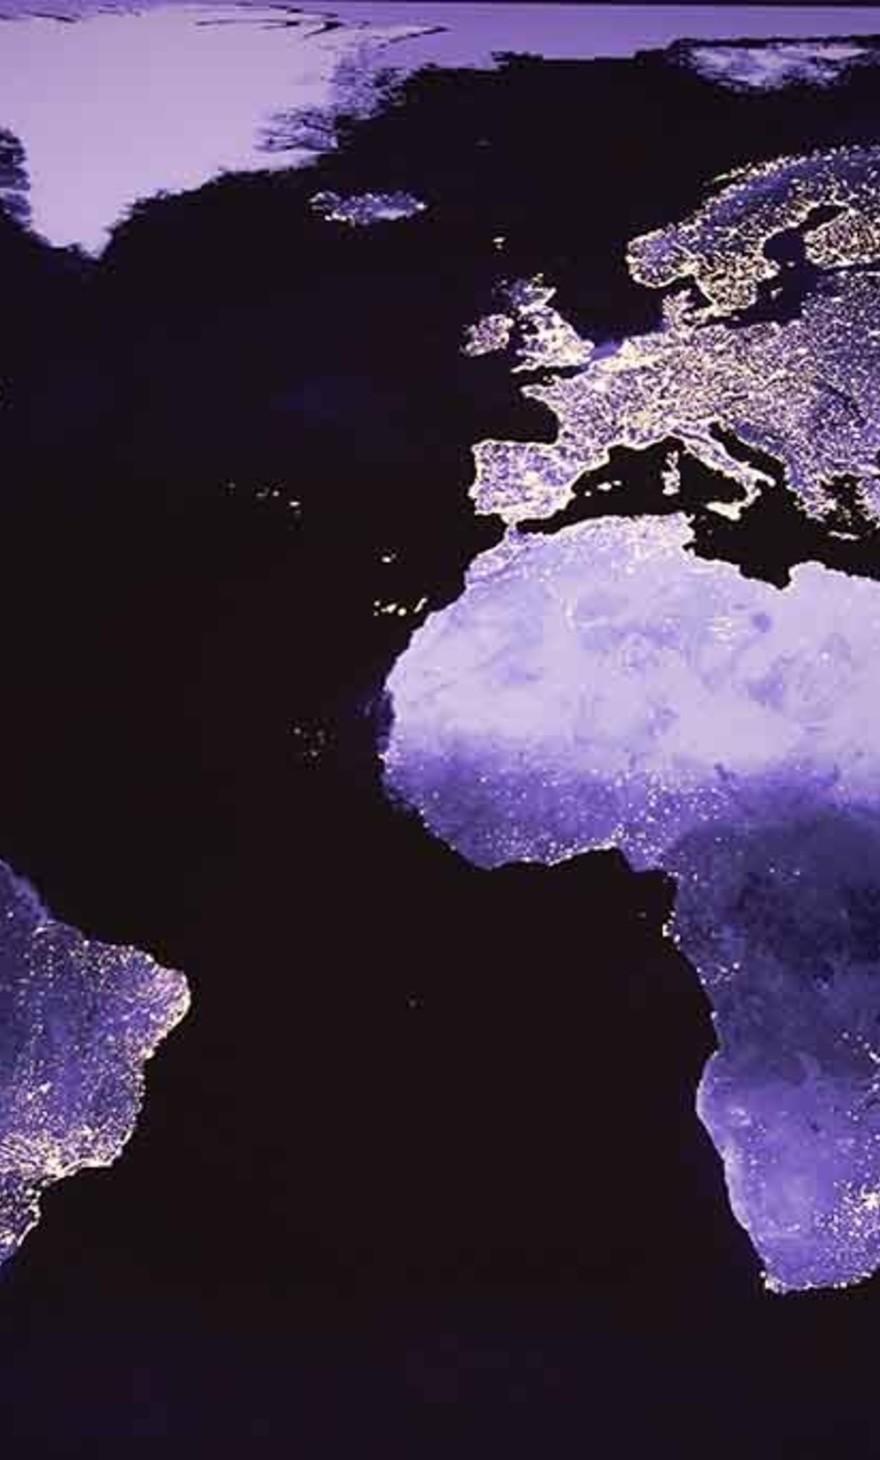 World by night